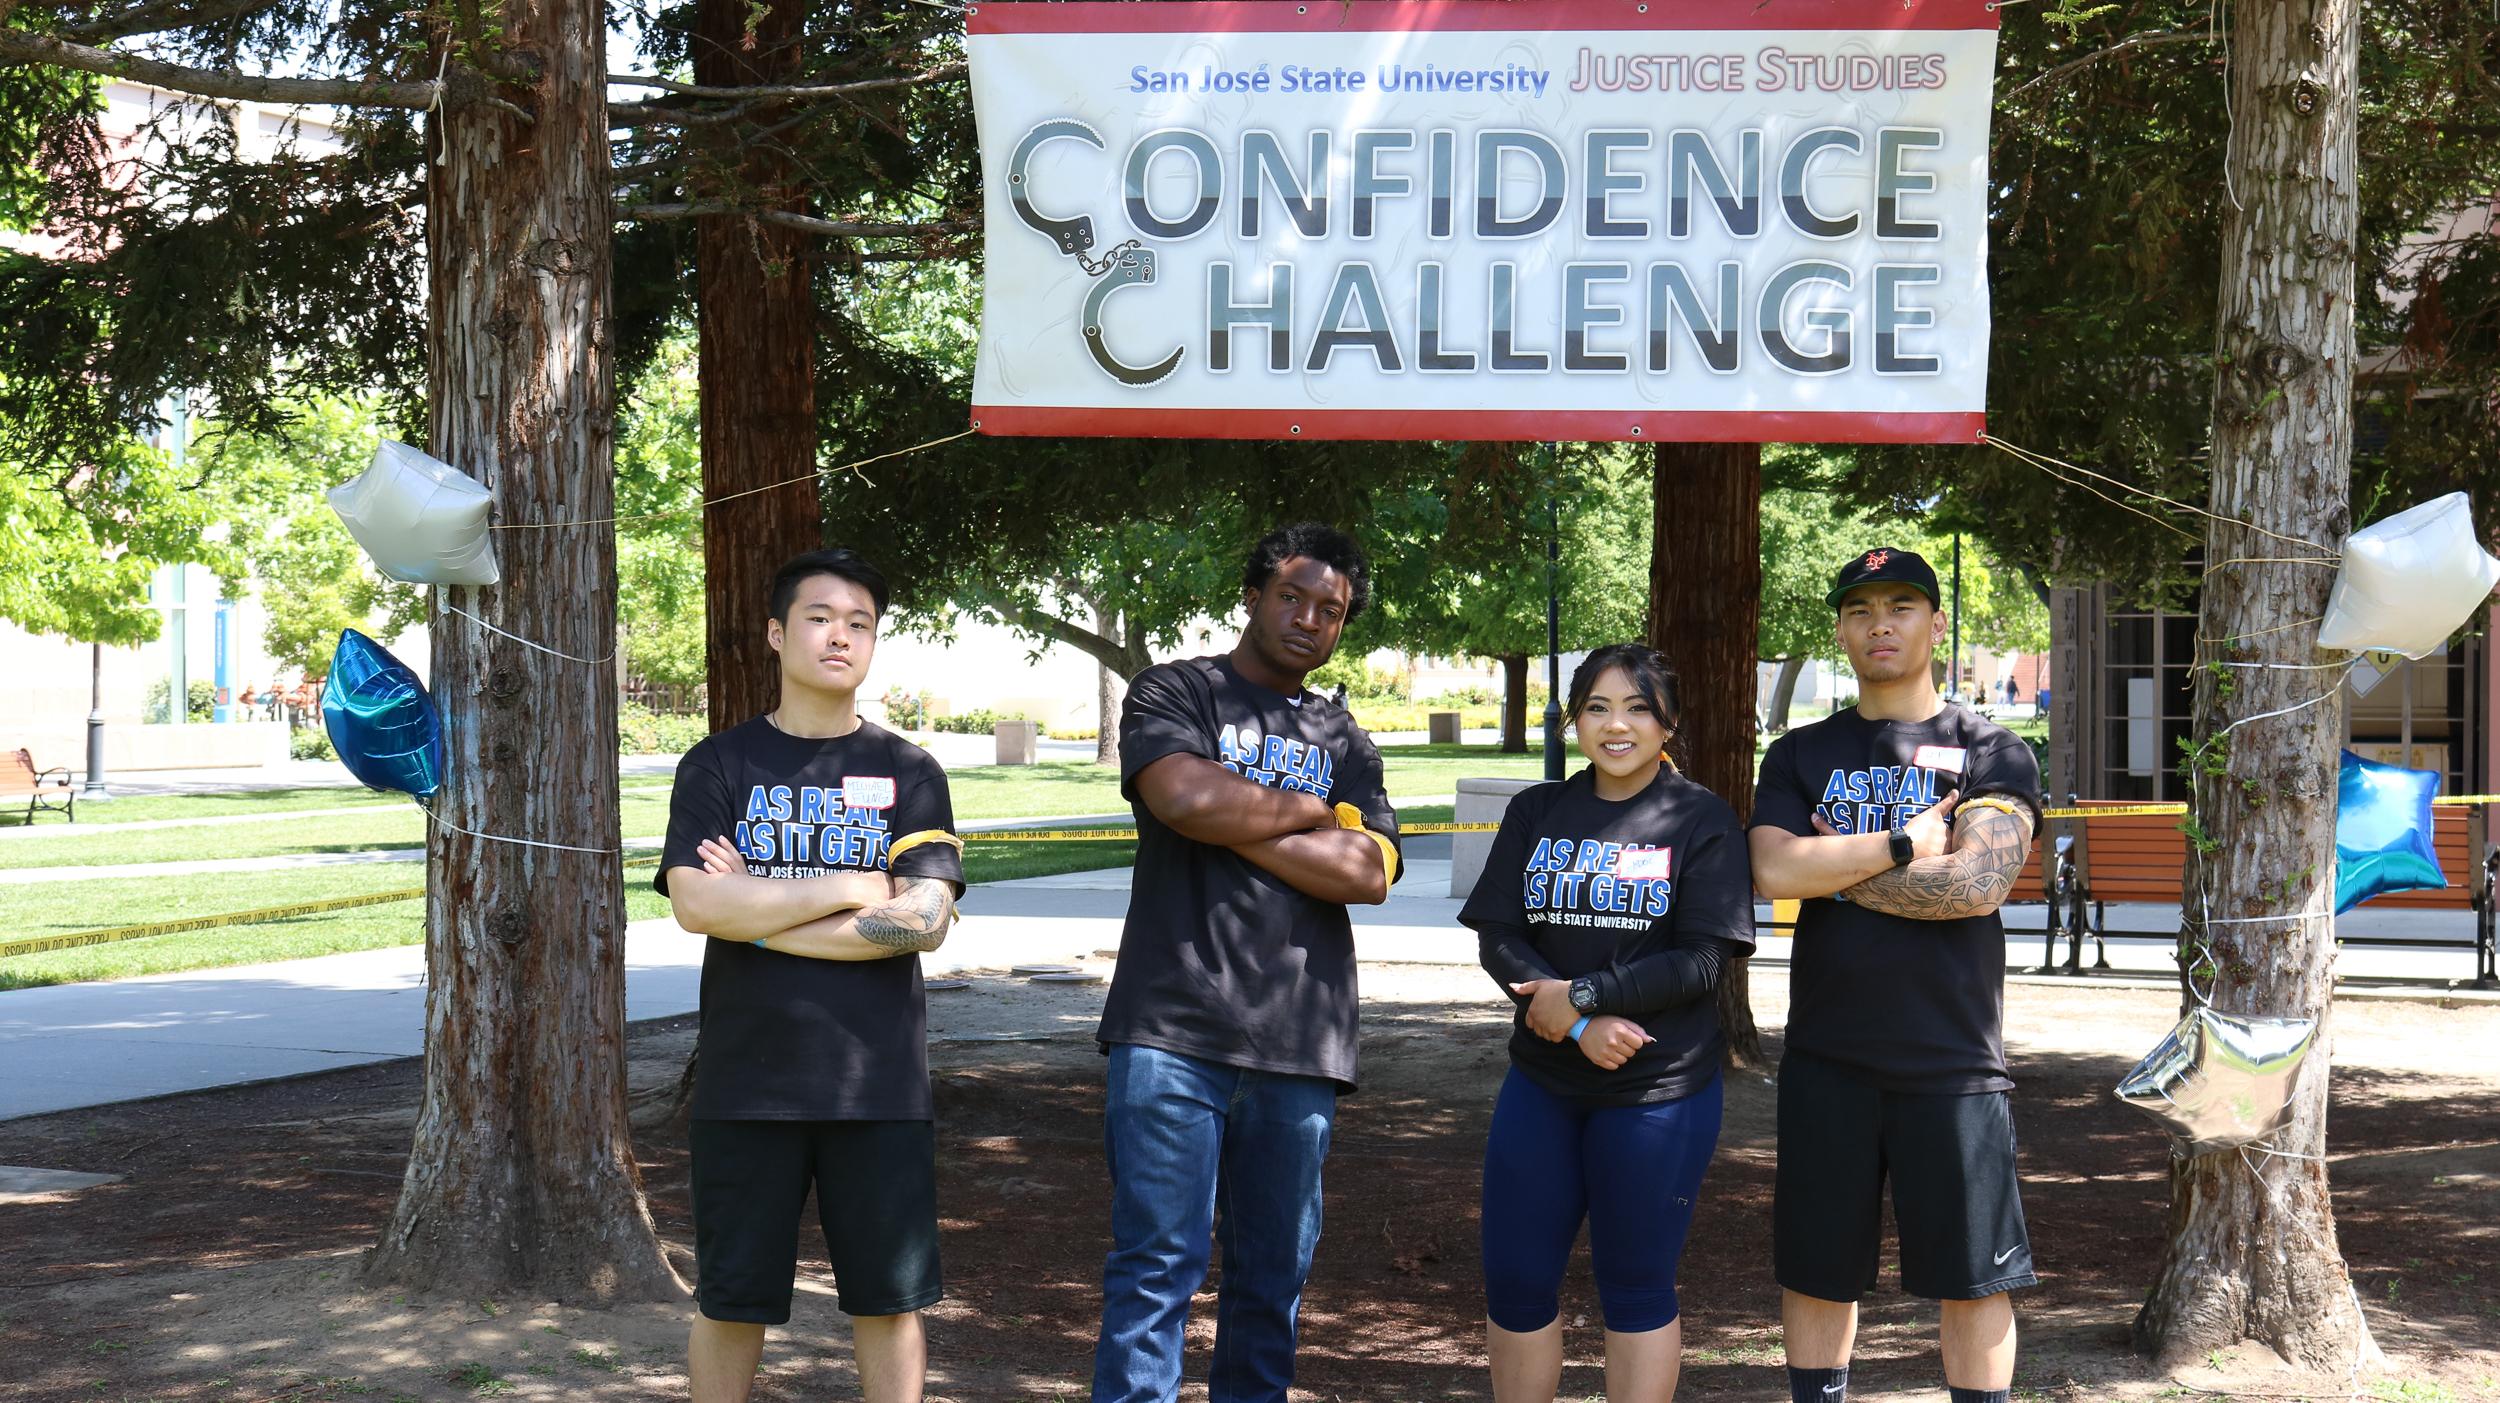 042817_Confidence_Challenge_Kameda-2.jpg